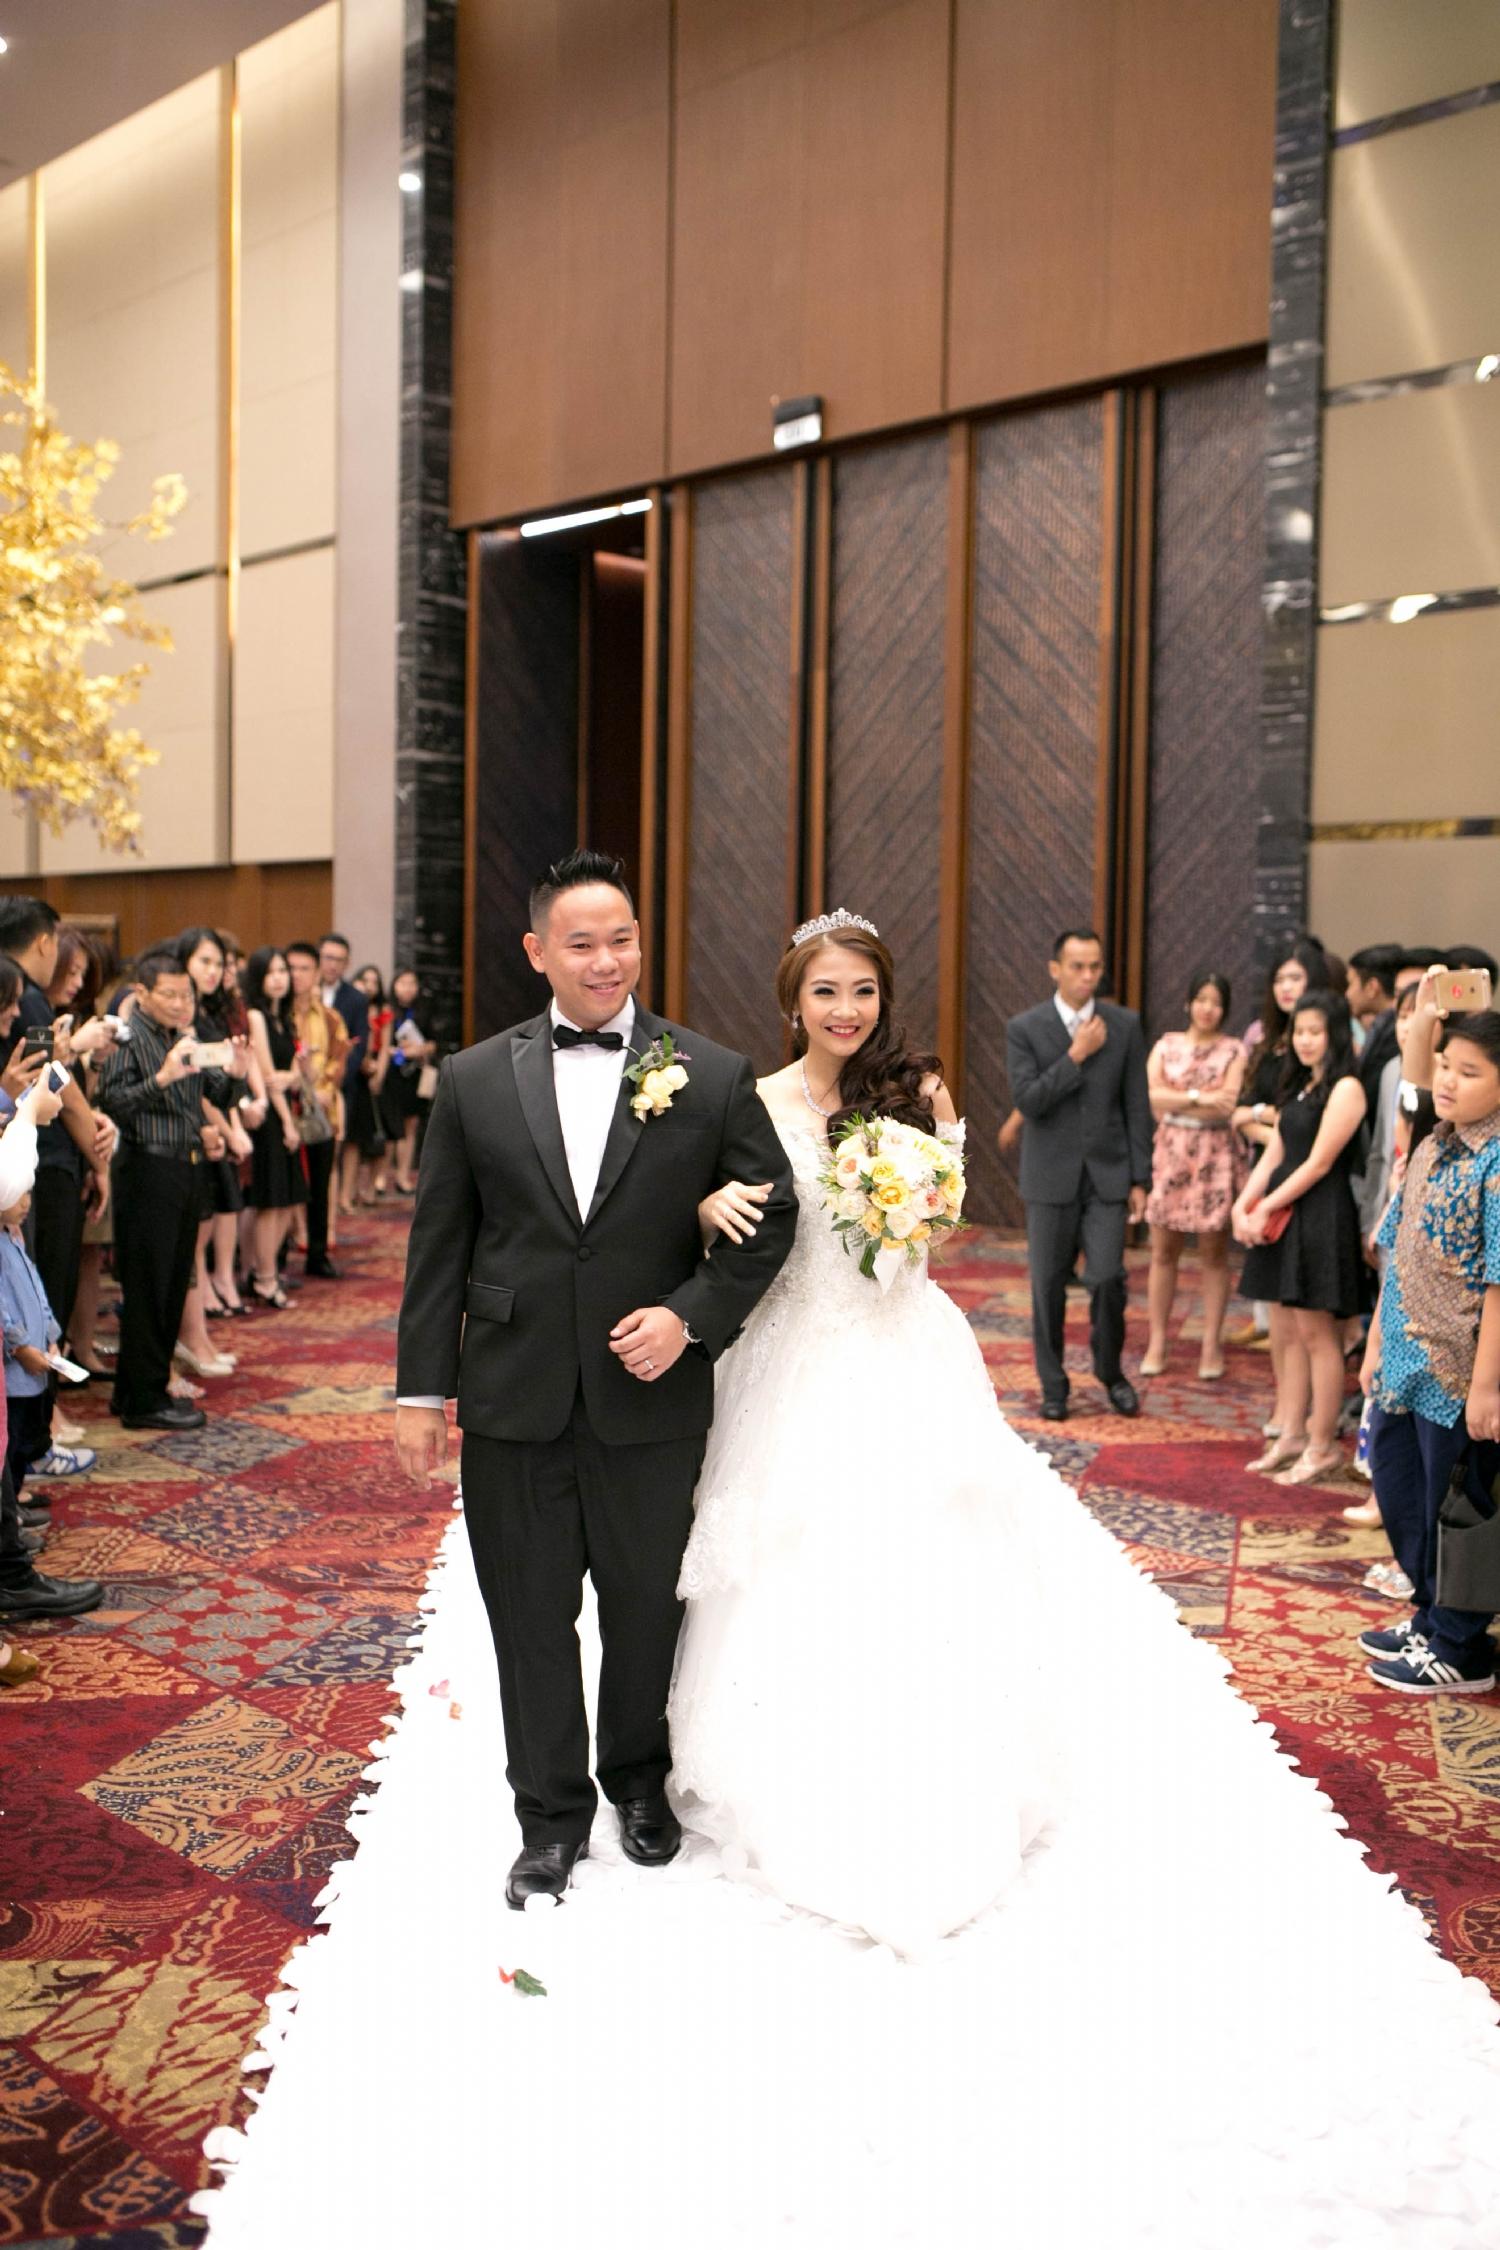 Wedding Of Peter And Linda By Pizzaro Sensation Design Houseofcuff Collar Bar Lapel Pin Bros Jas Best Man Bow Tie Grey